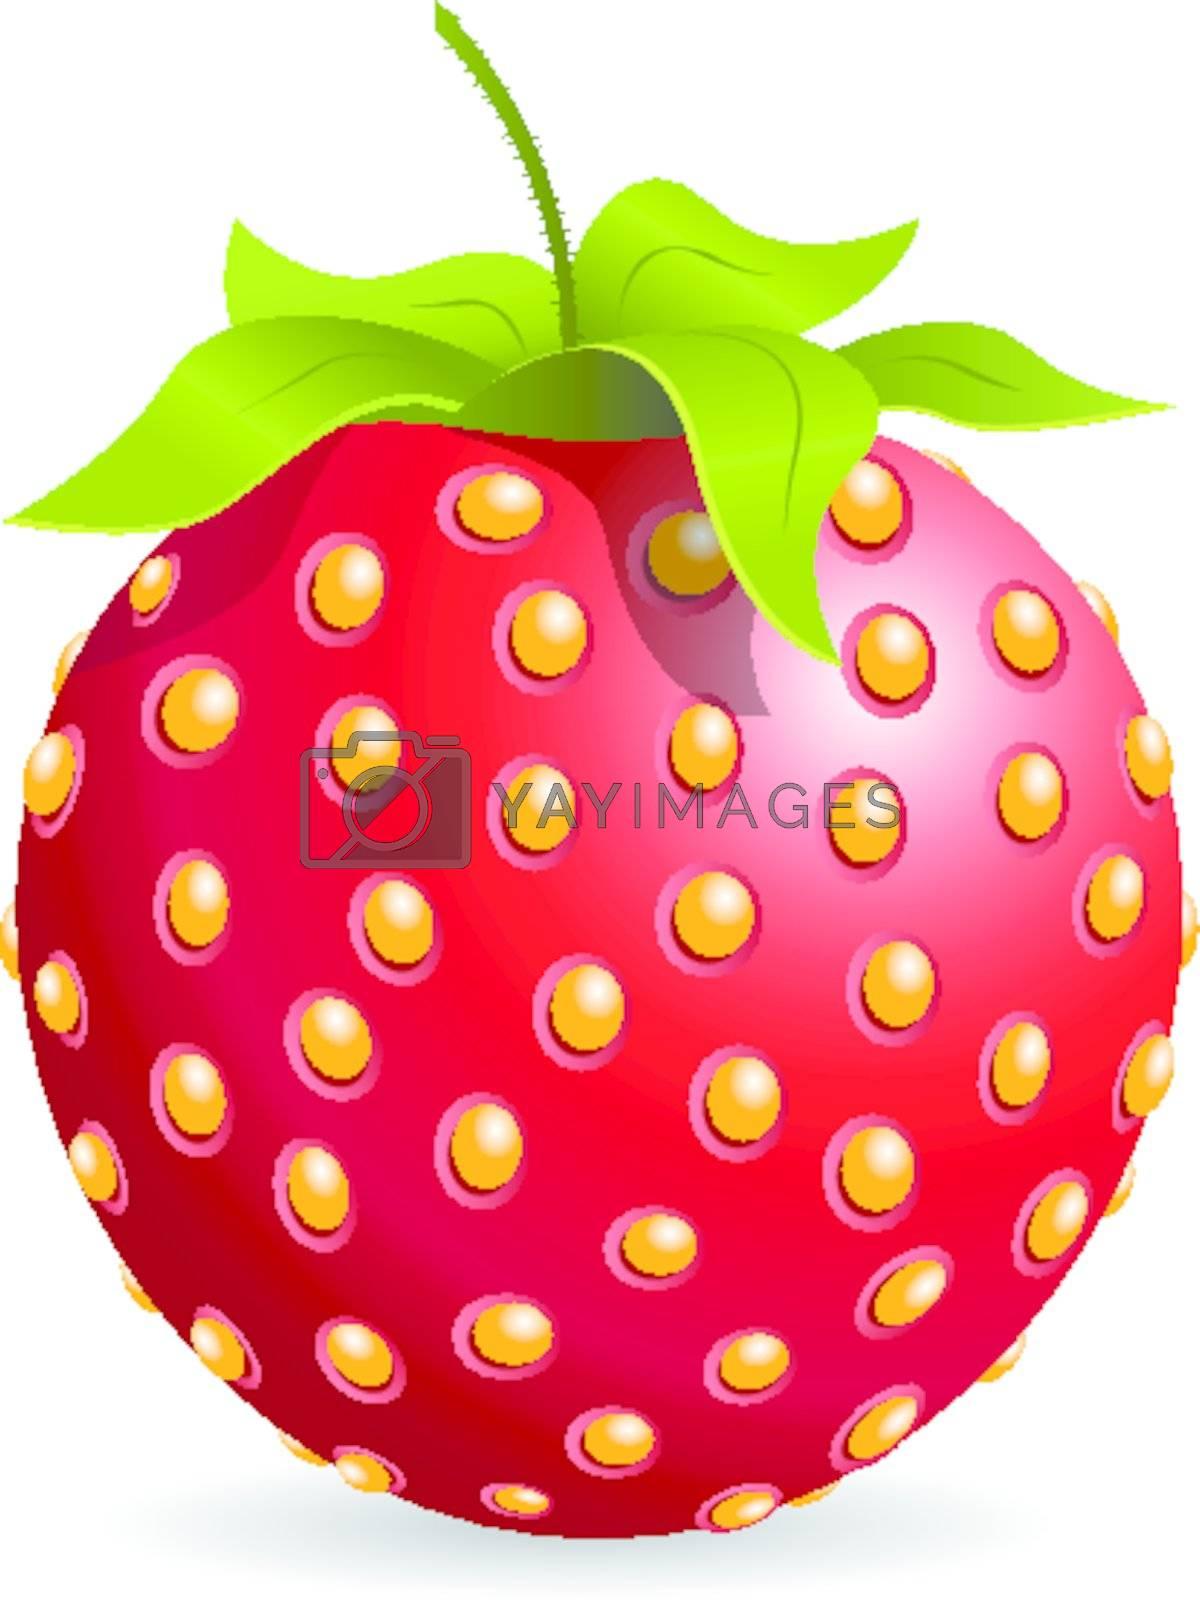 illustration, single red strawberry on white background